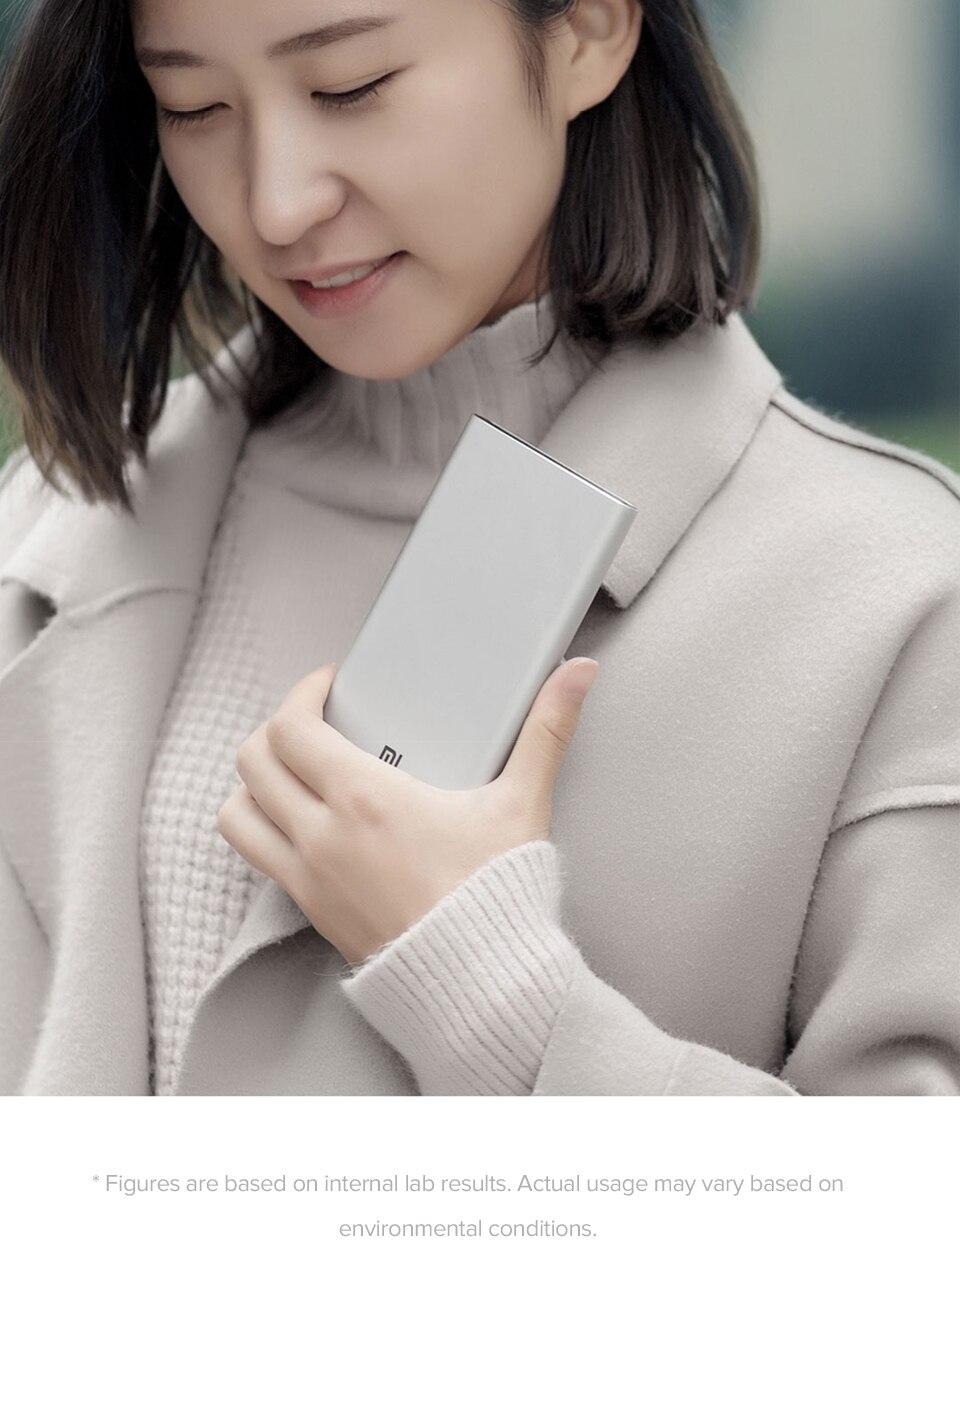 Аккумулятор Xiaomi Mi Power Bank 3 10000 PLM13ZM Fast Charge Version Недорогой внешний аккумулятор с быстрой зарядкой